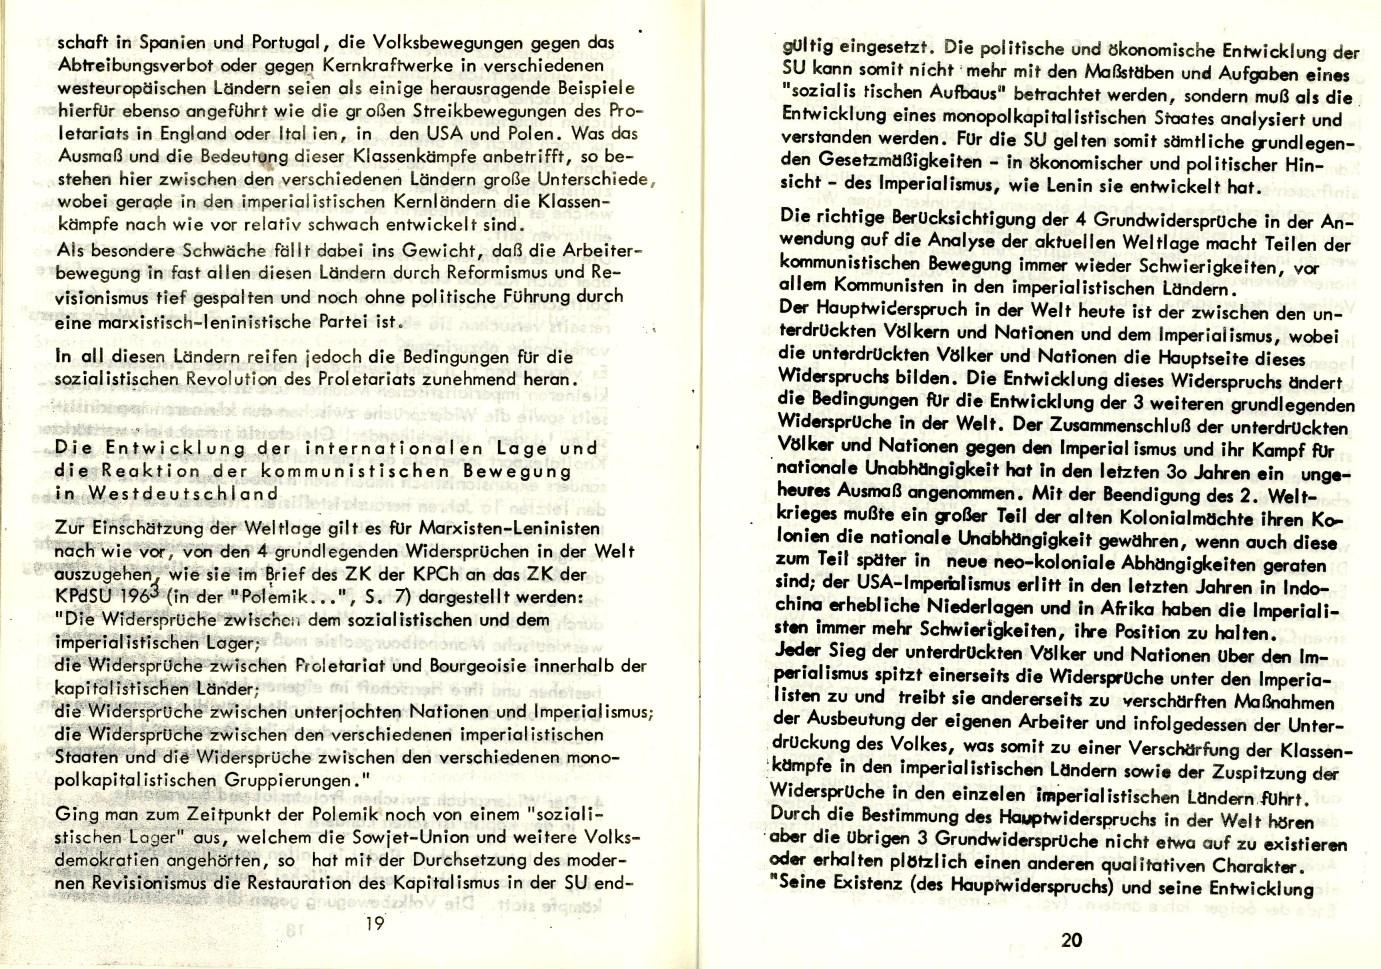 KGBE_1978_Resolutionen_11